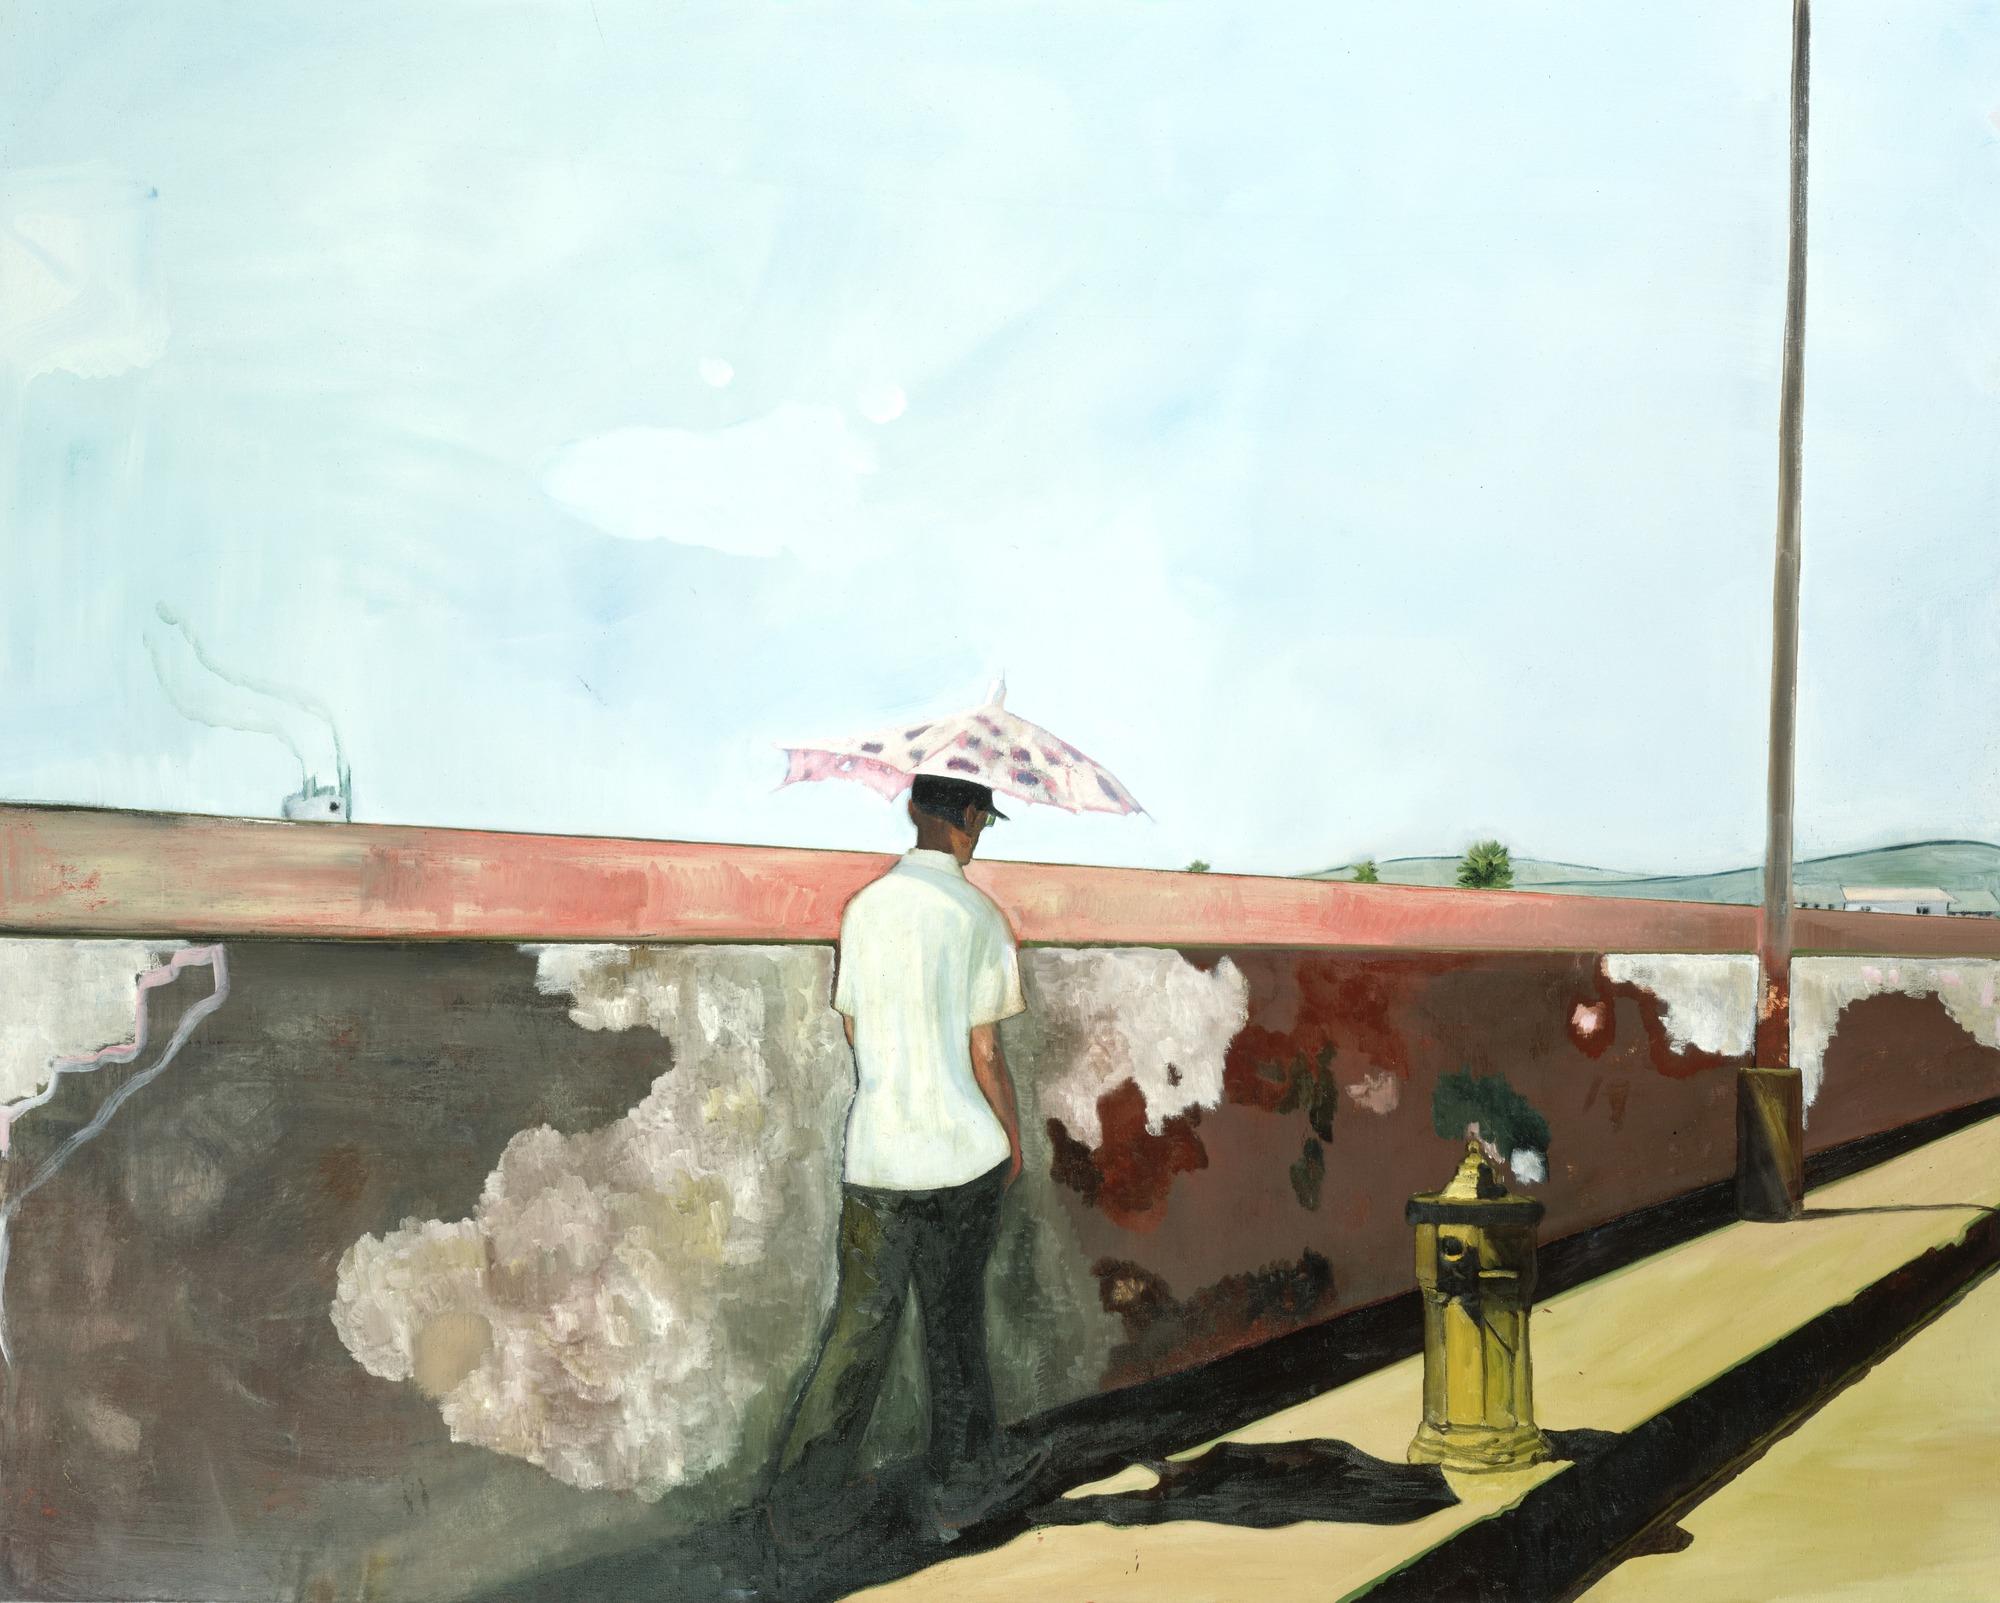 Peter Doig. Lapeyrouse Wall. 2004 | MoMA